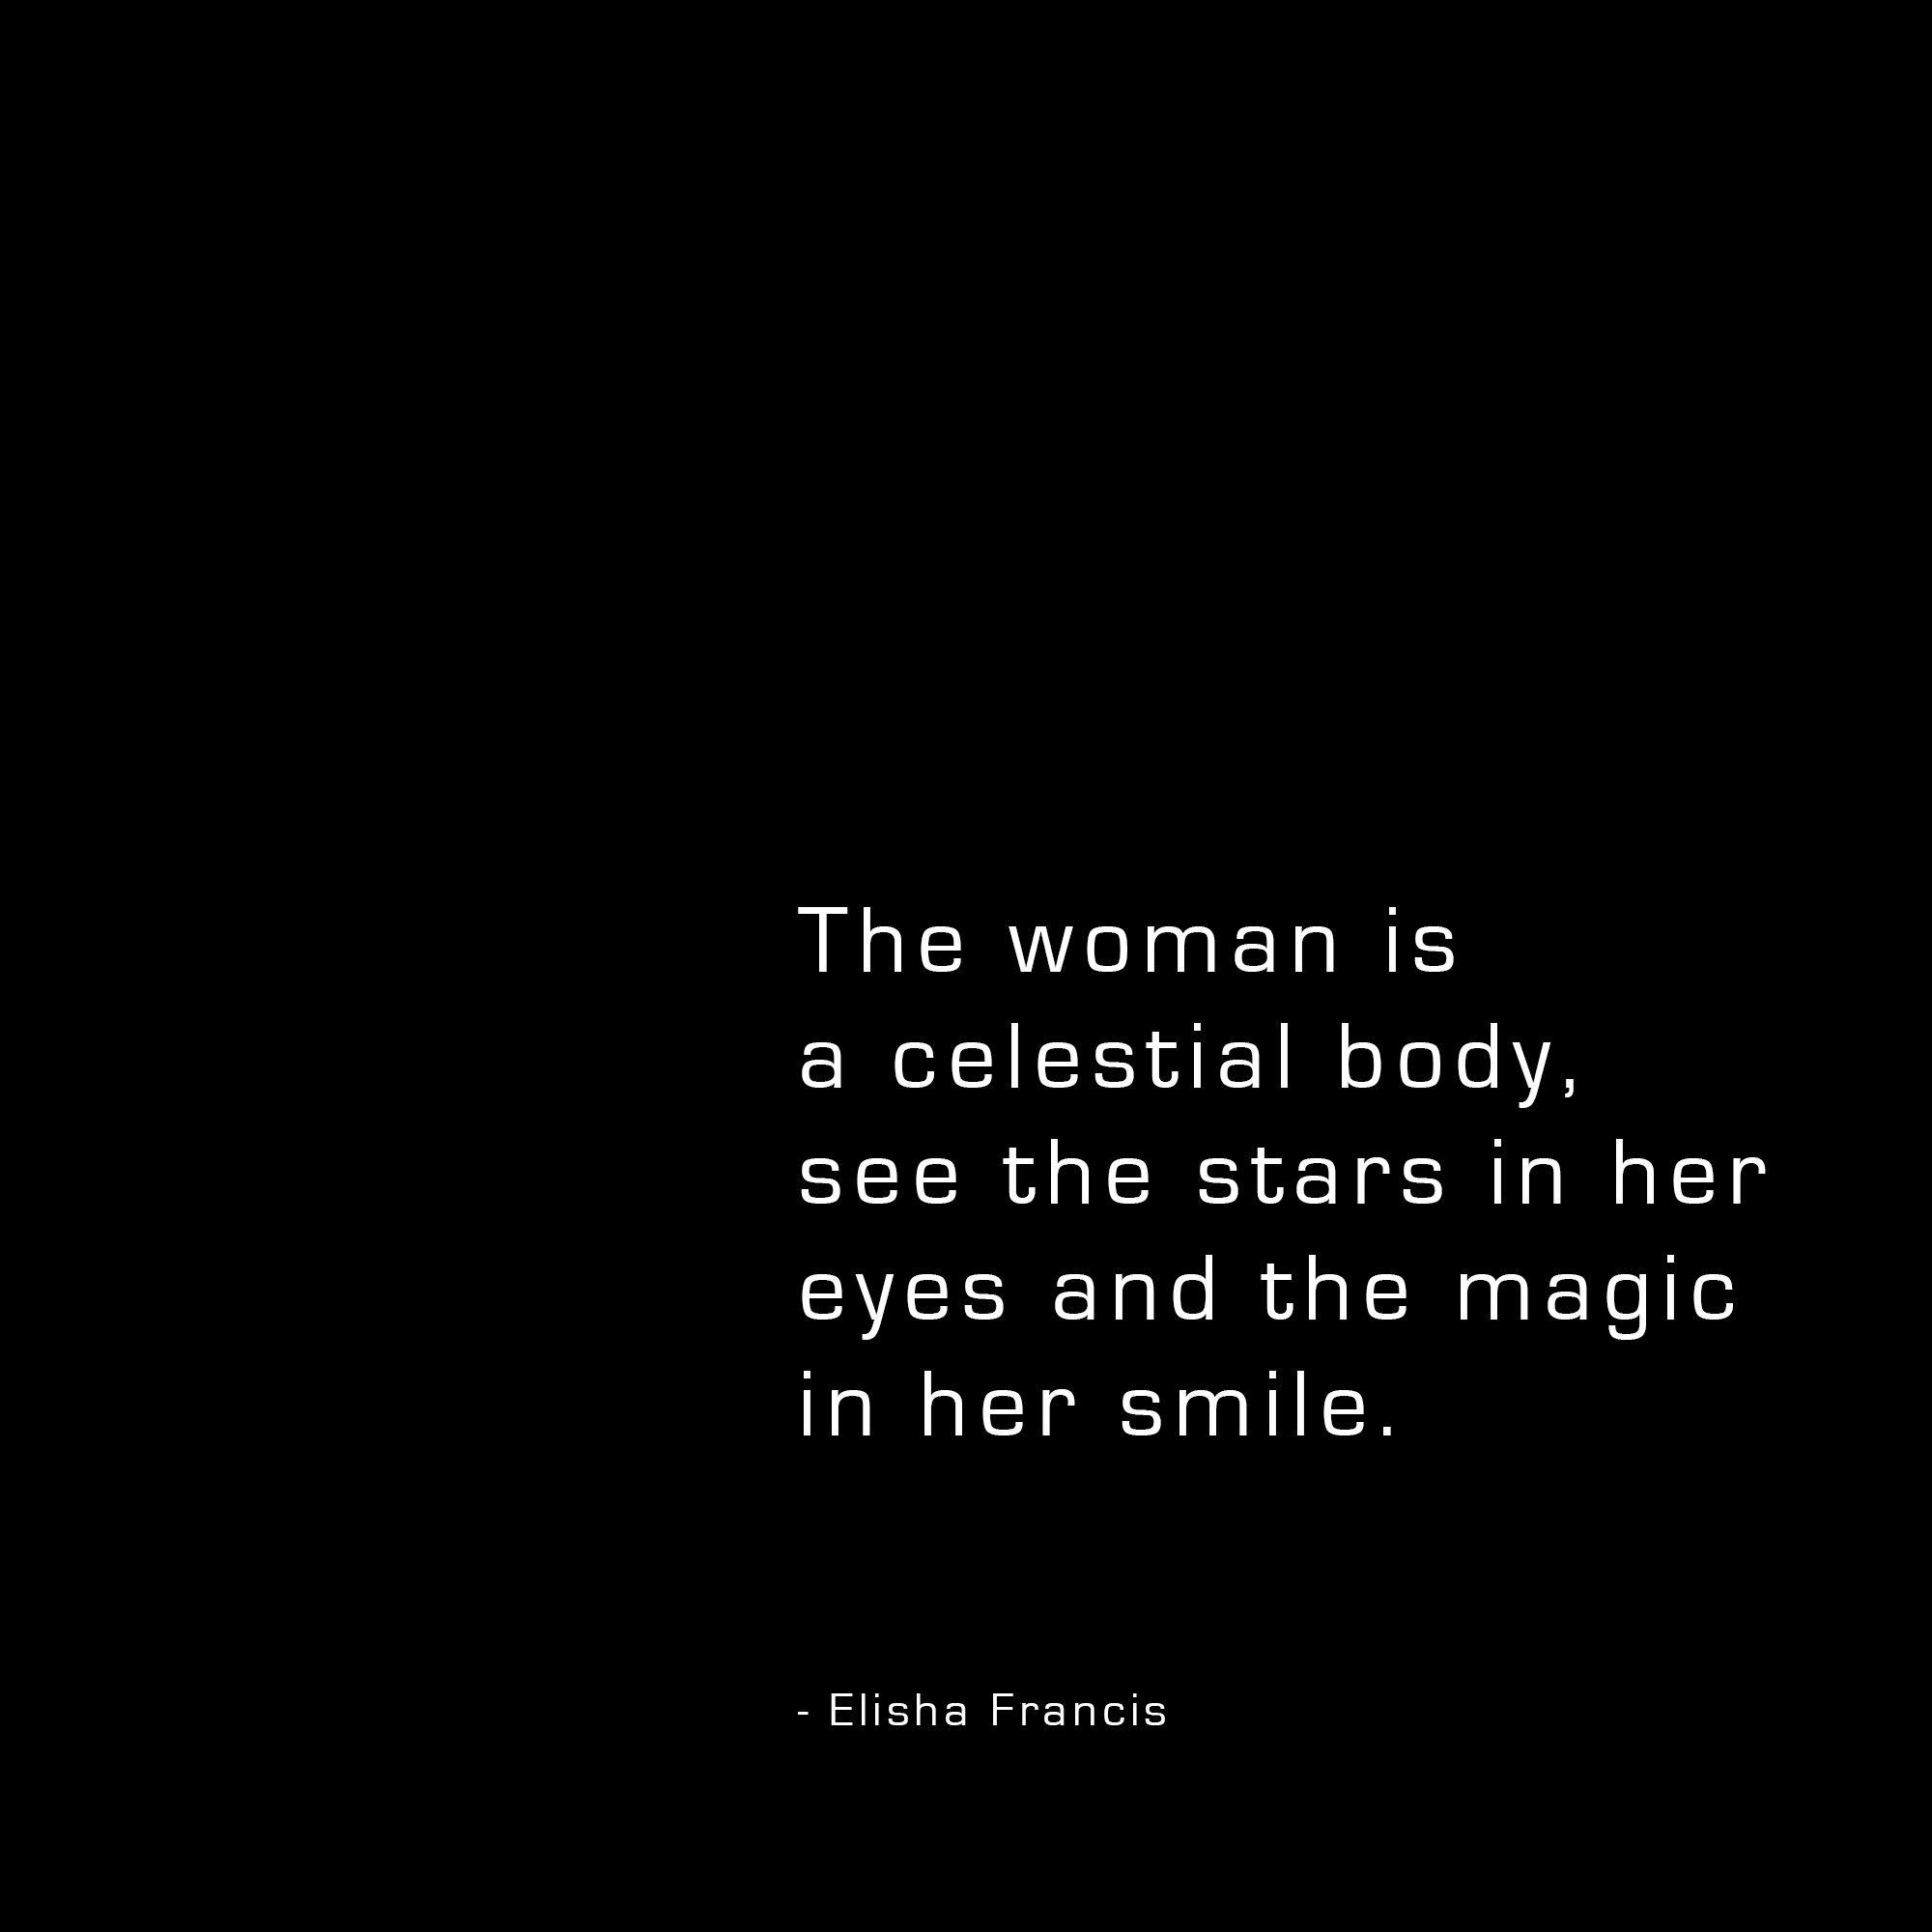 Celestial Woman poem by Elisha Francis